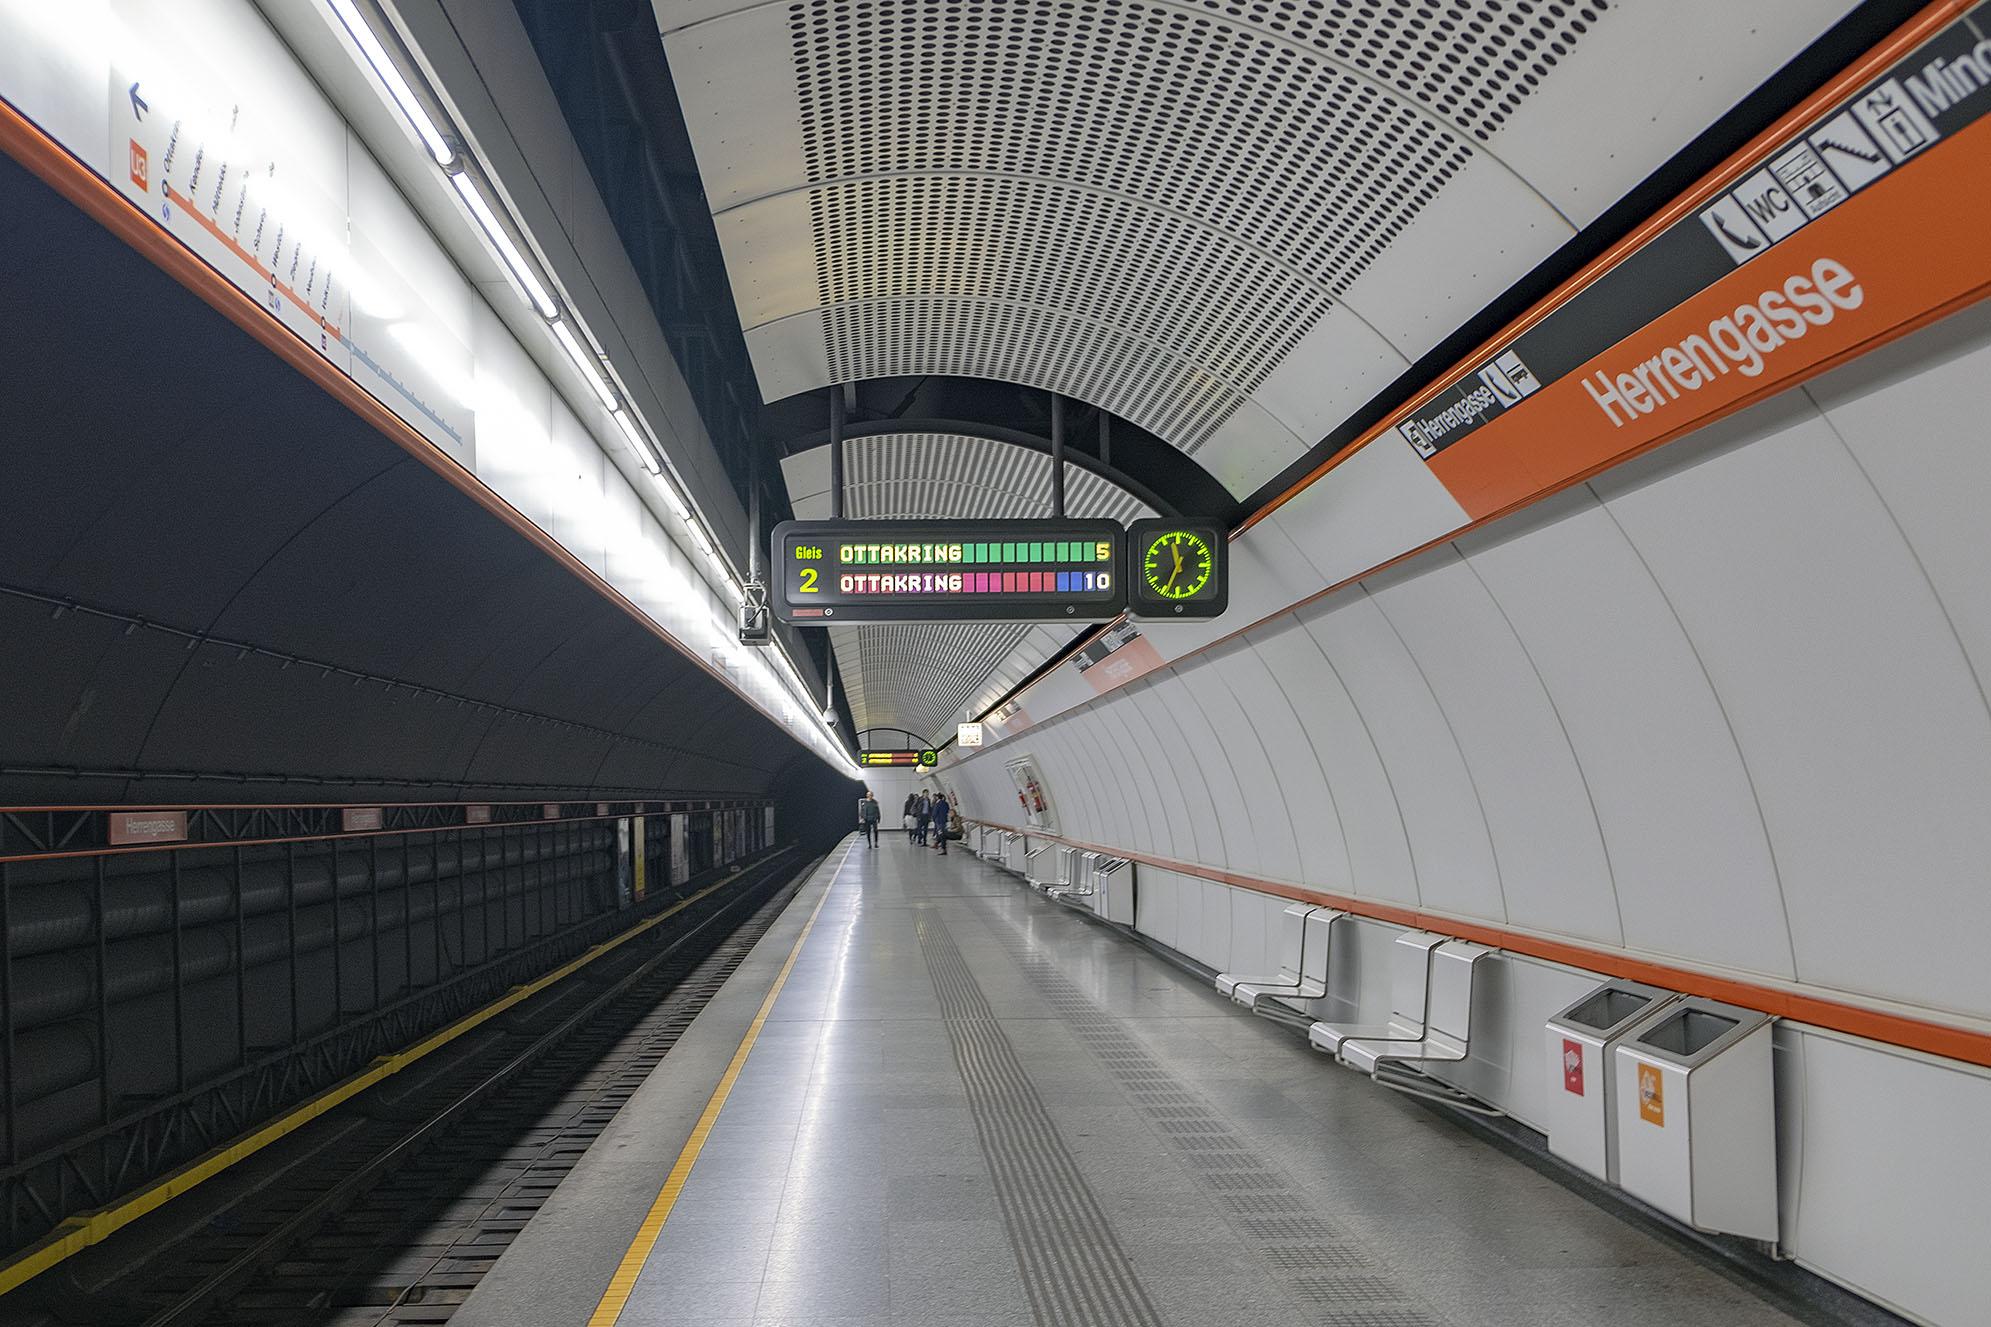 Tunnelbanestationen Herrengasse